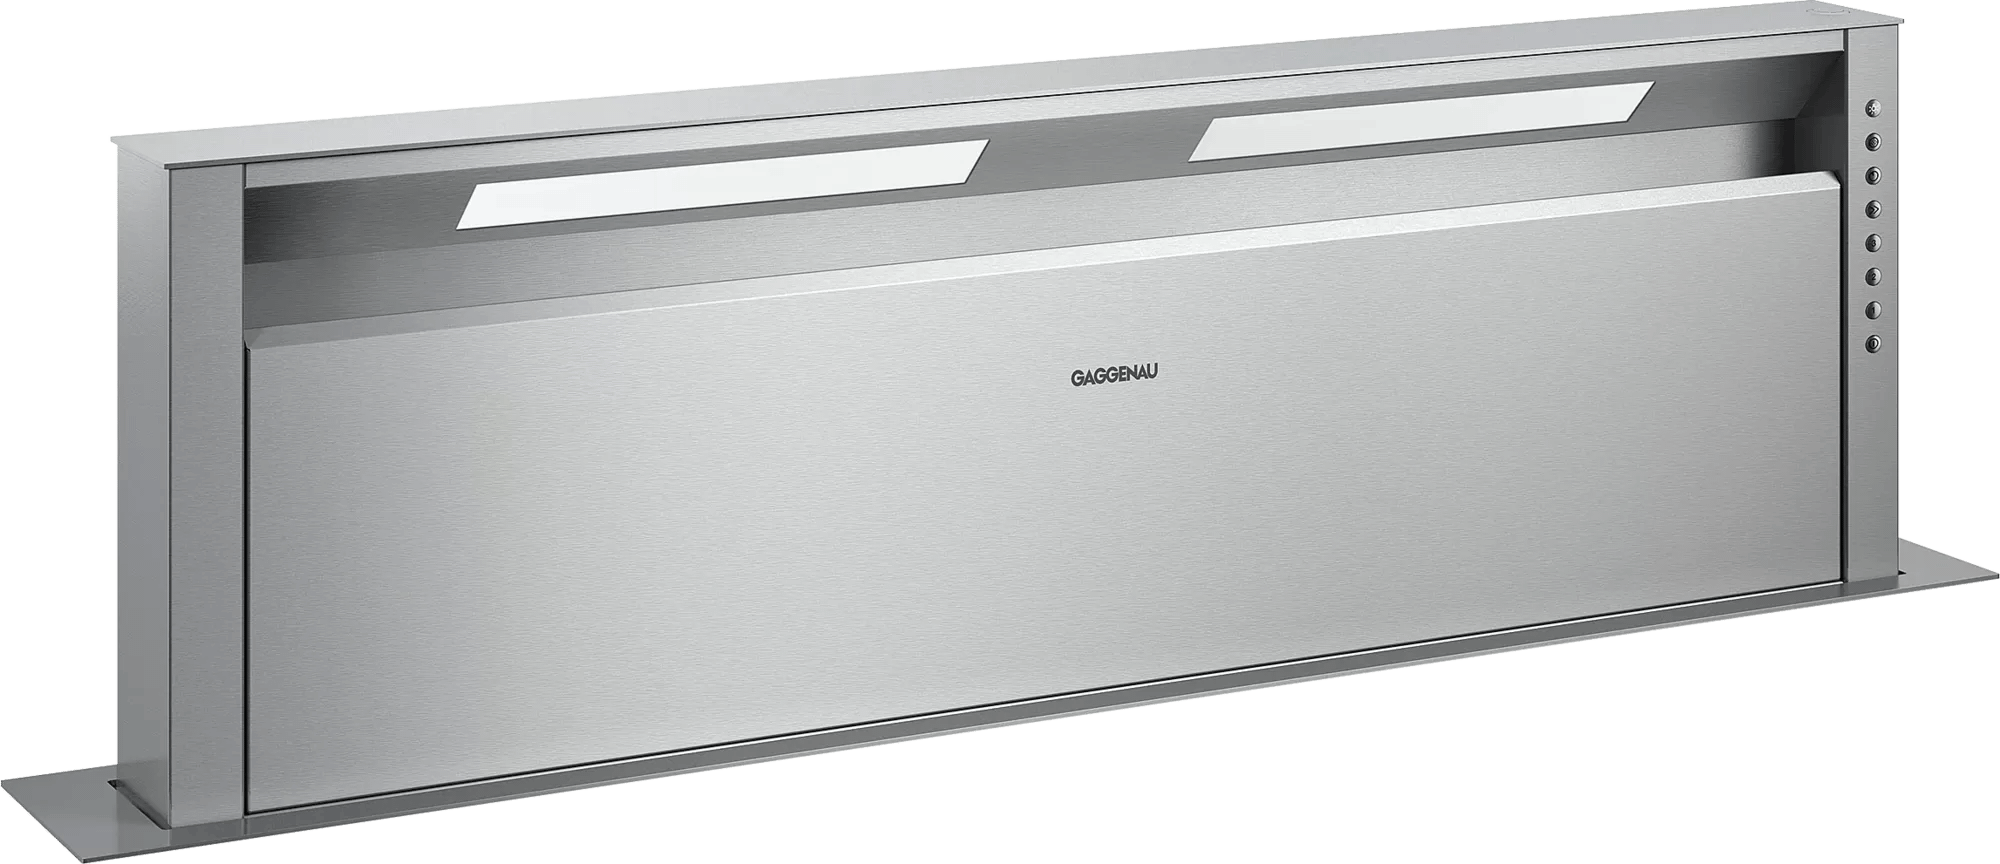 Gaggenau400 Series Backsplash Ventilation 48'' Stainless Steel